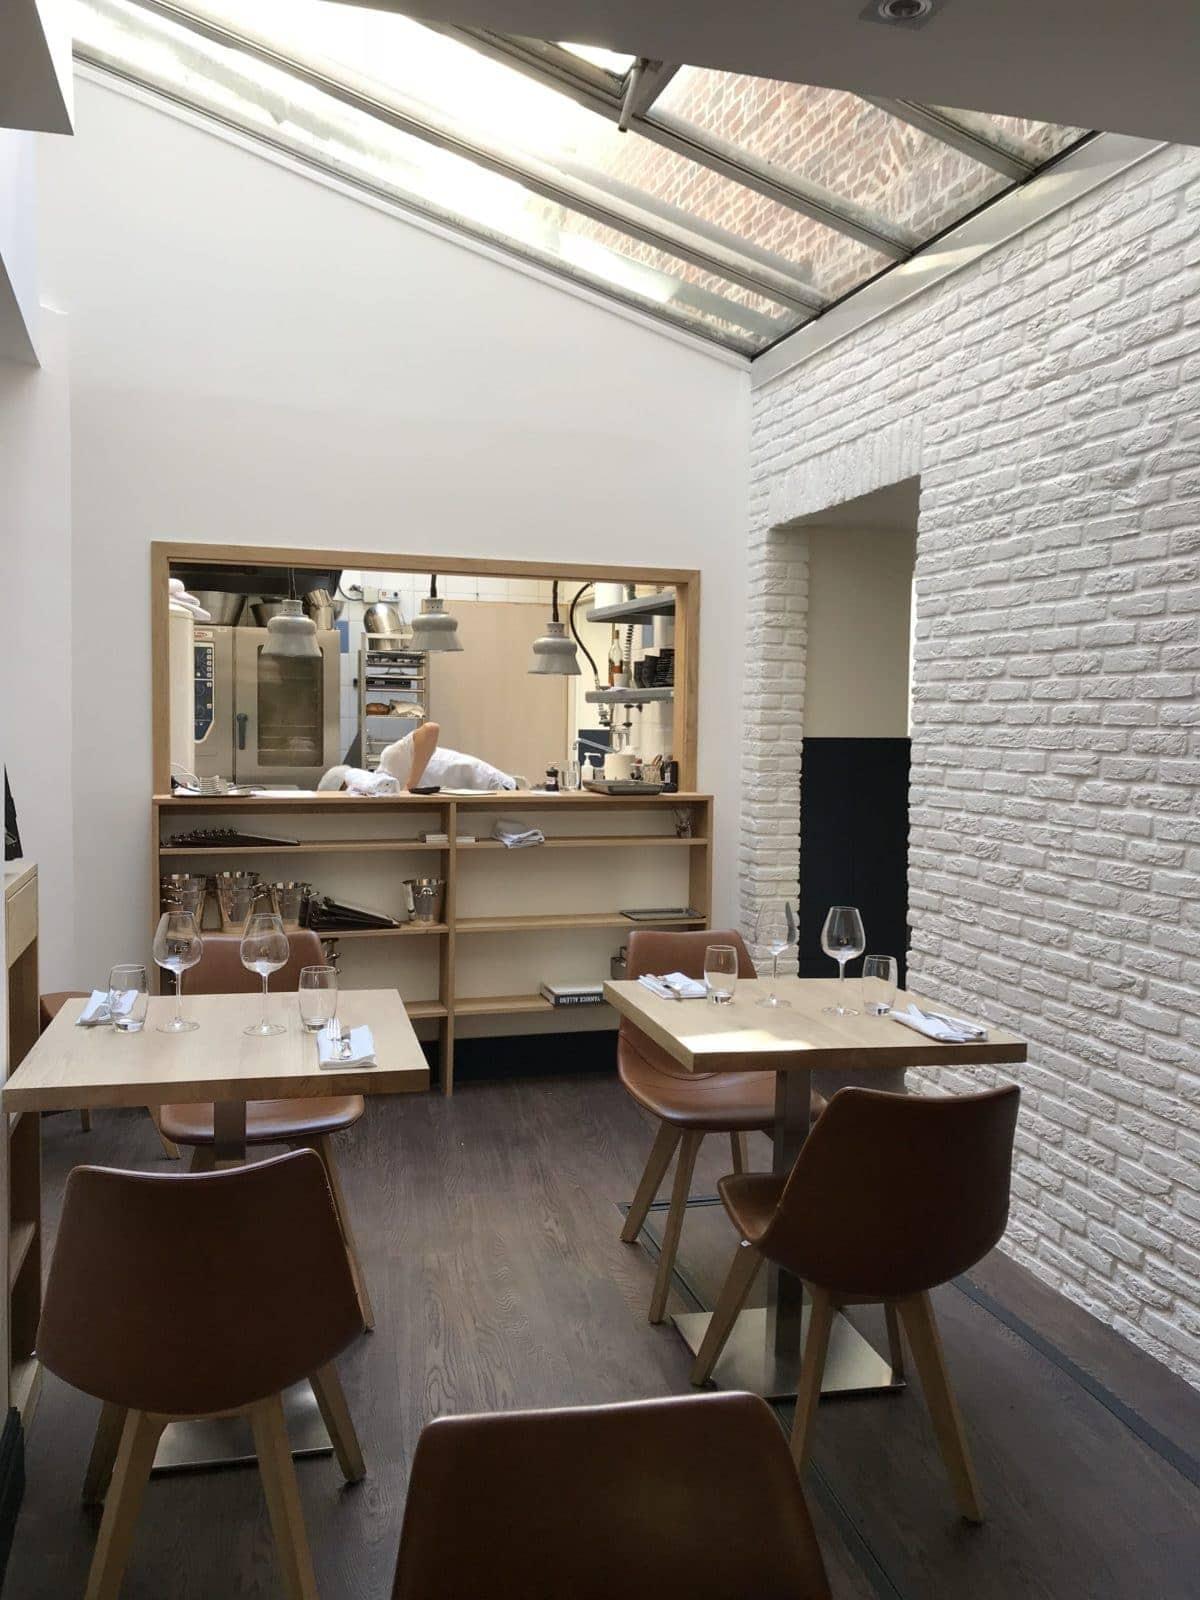 amelioration-eclairage-puisard-de-lumiere-restaurant-club-marot-lille